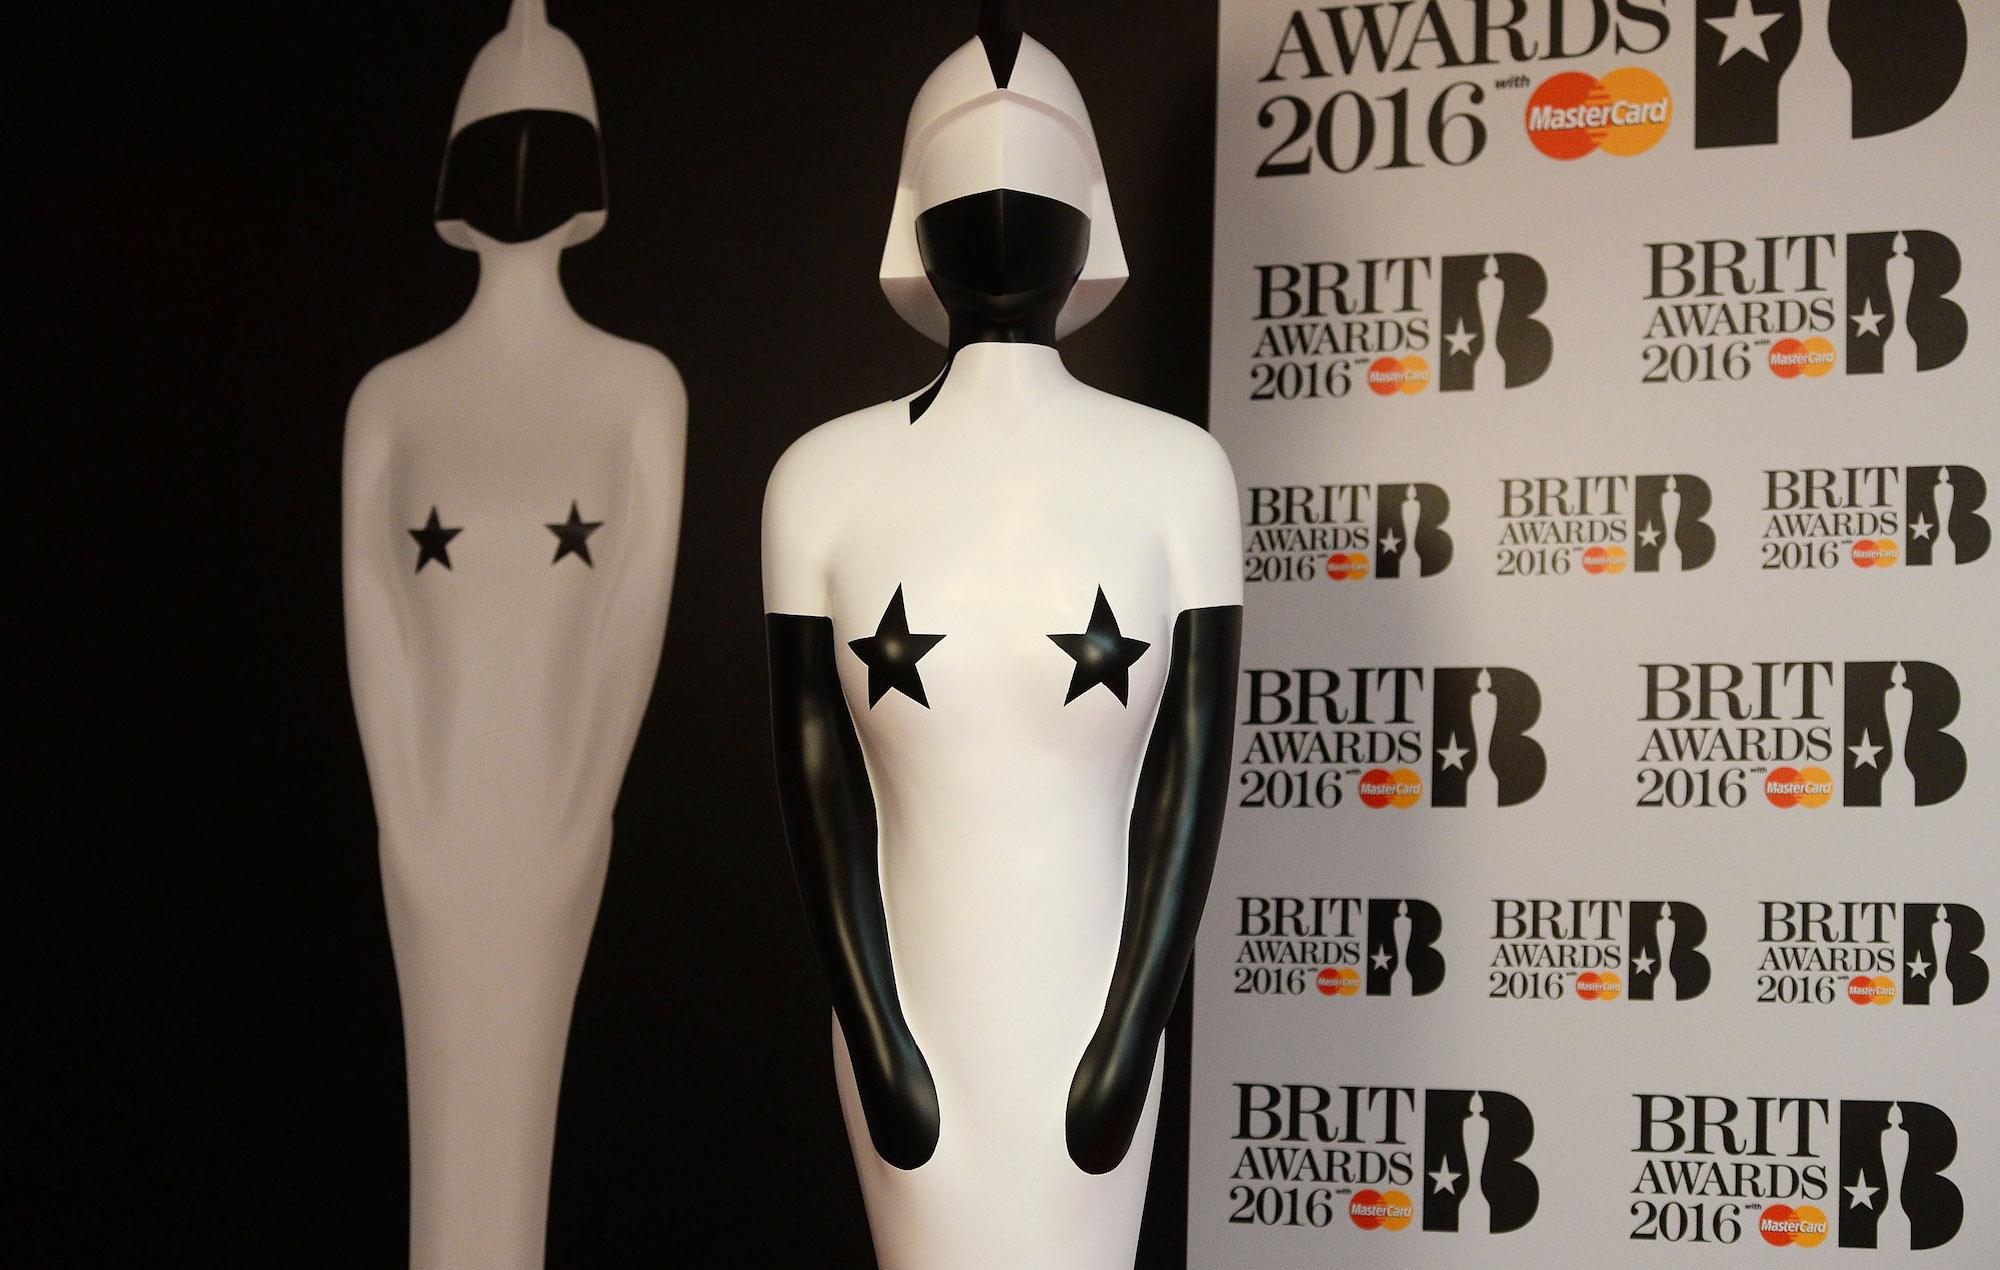 Brit Awards 2016 statue